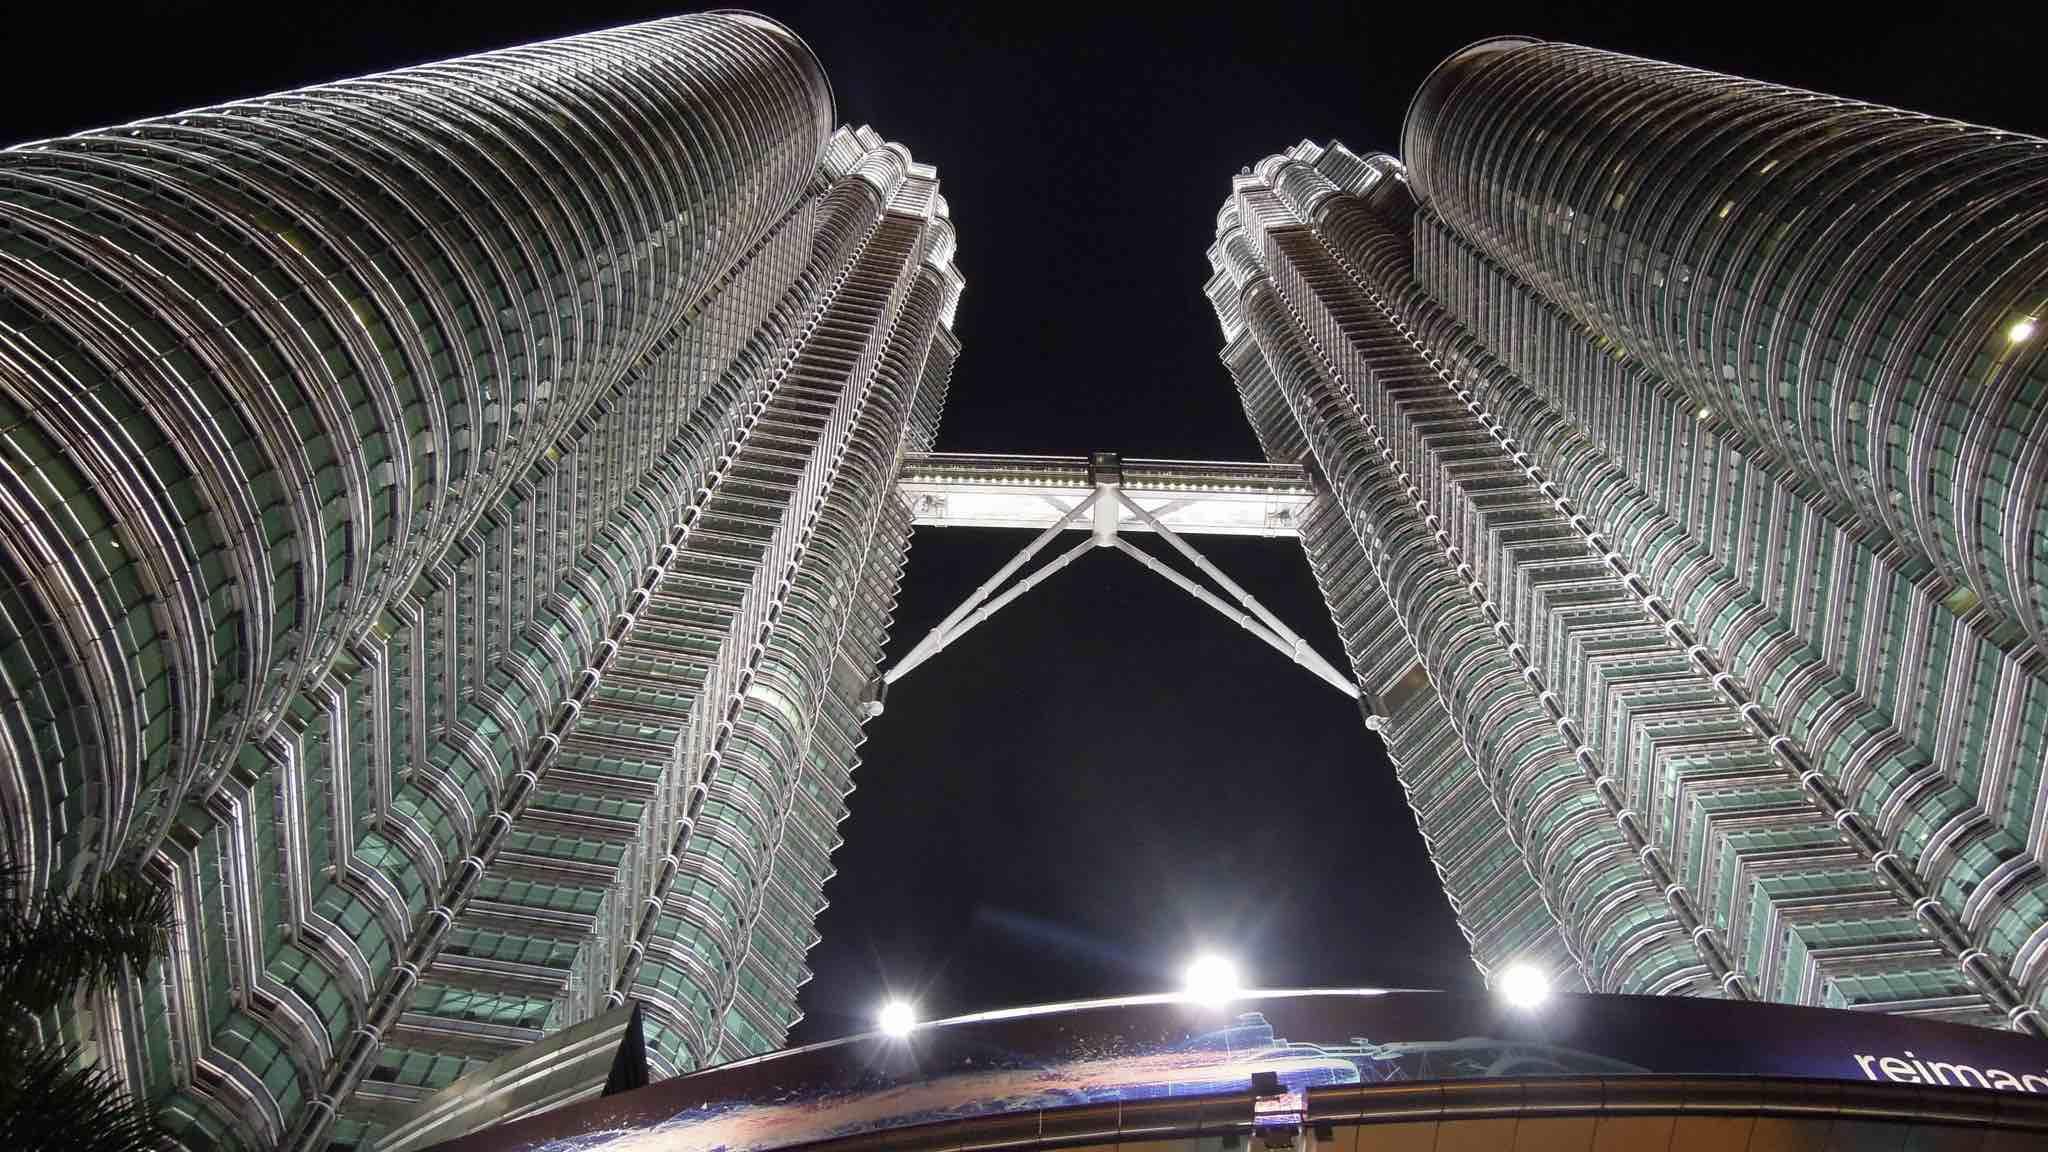 Petronas Towers, Kuala Lumpur (Photo: David McKelvey/Flickr)